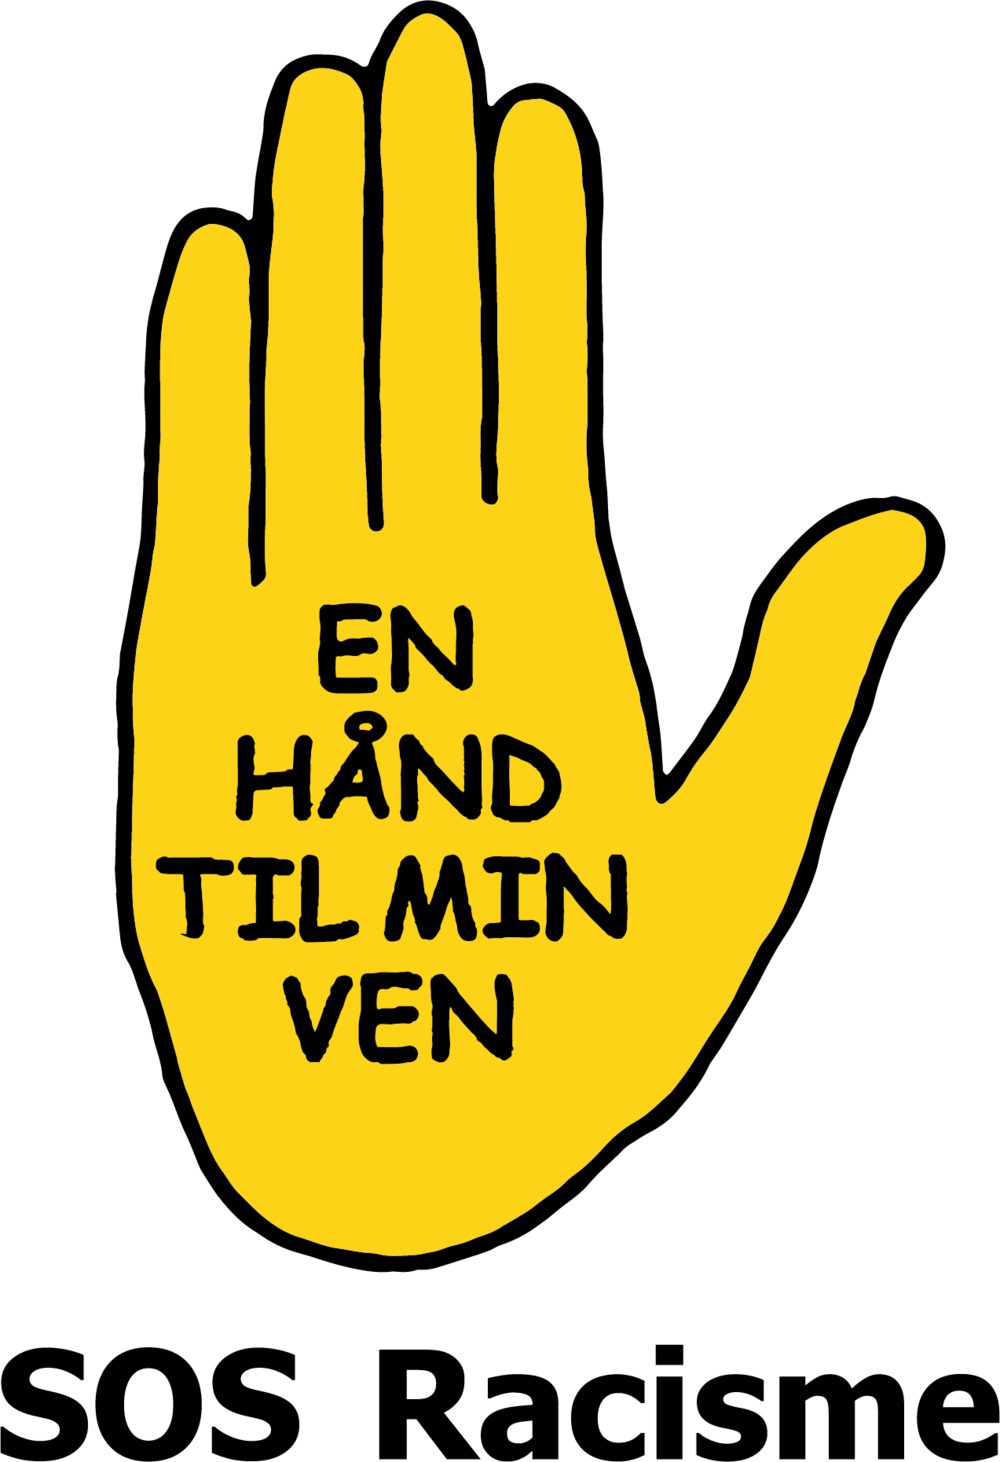 SOS mod racisme